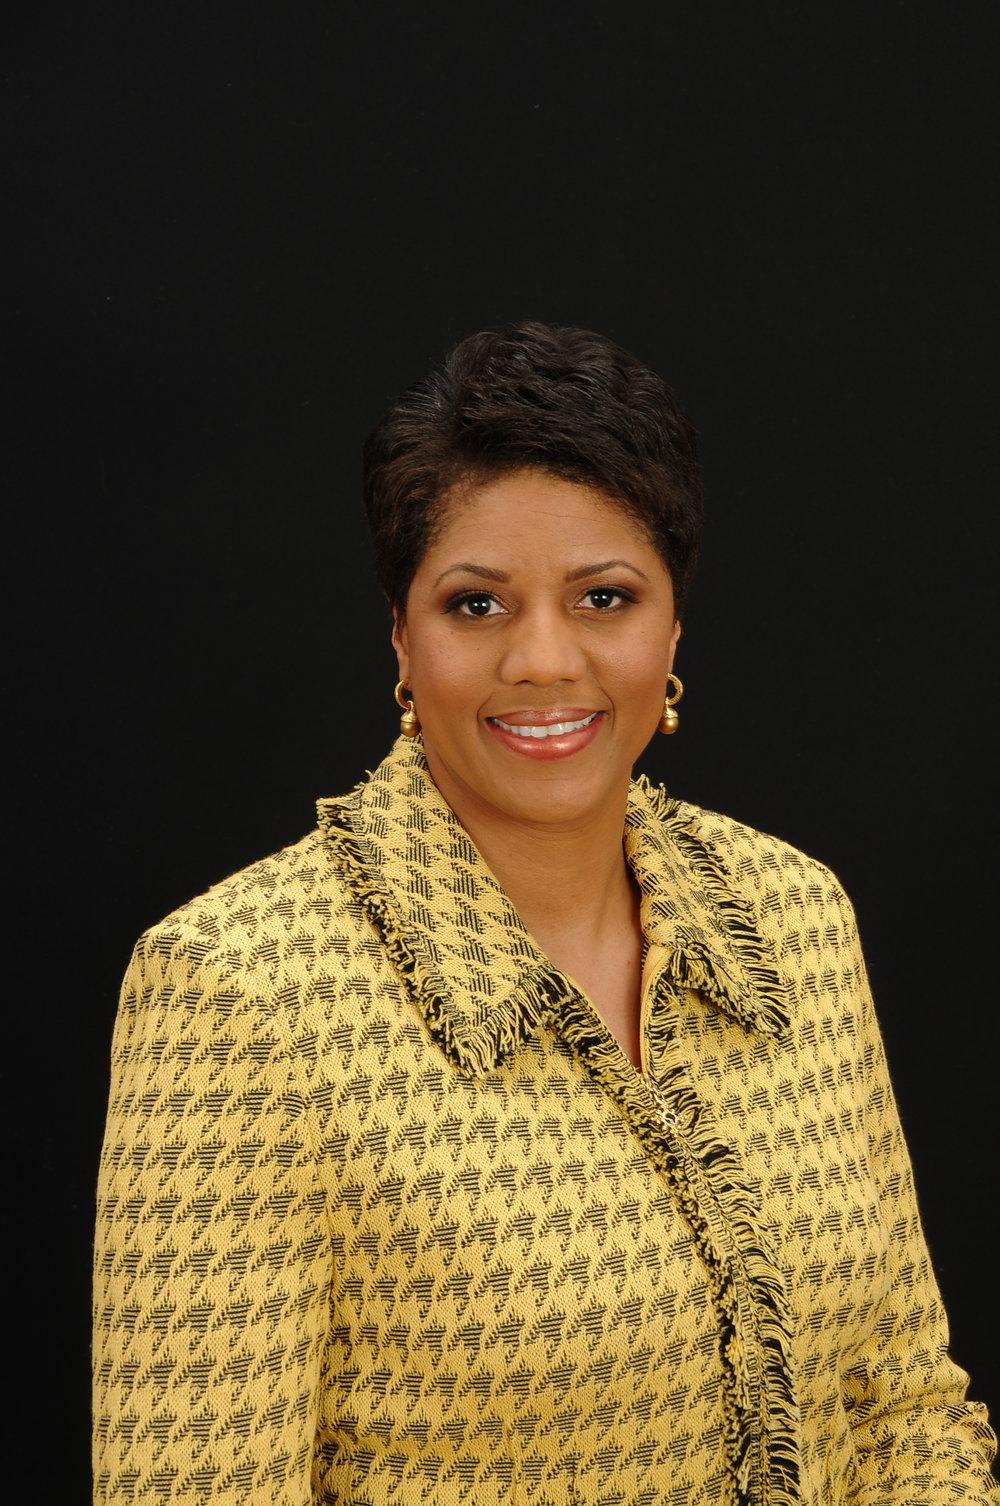 Felicia Hall Allen